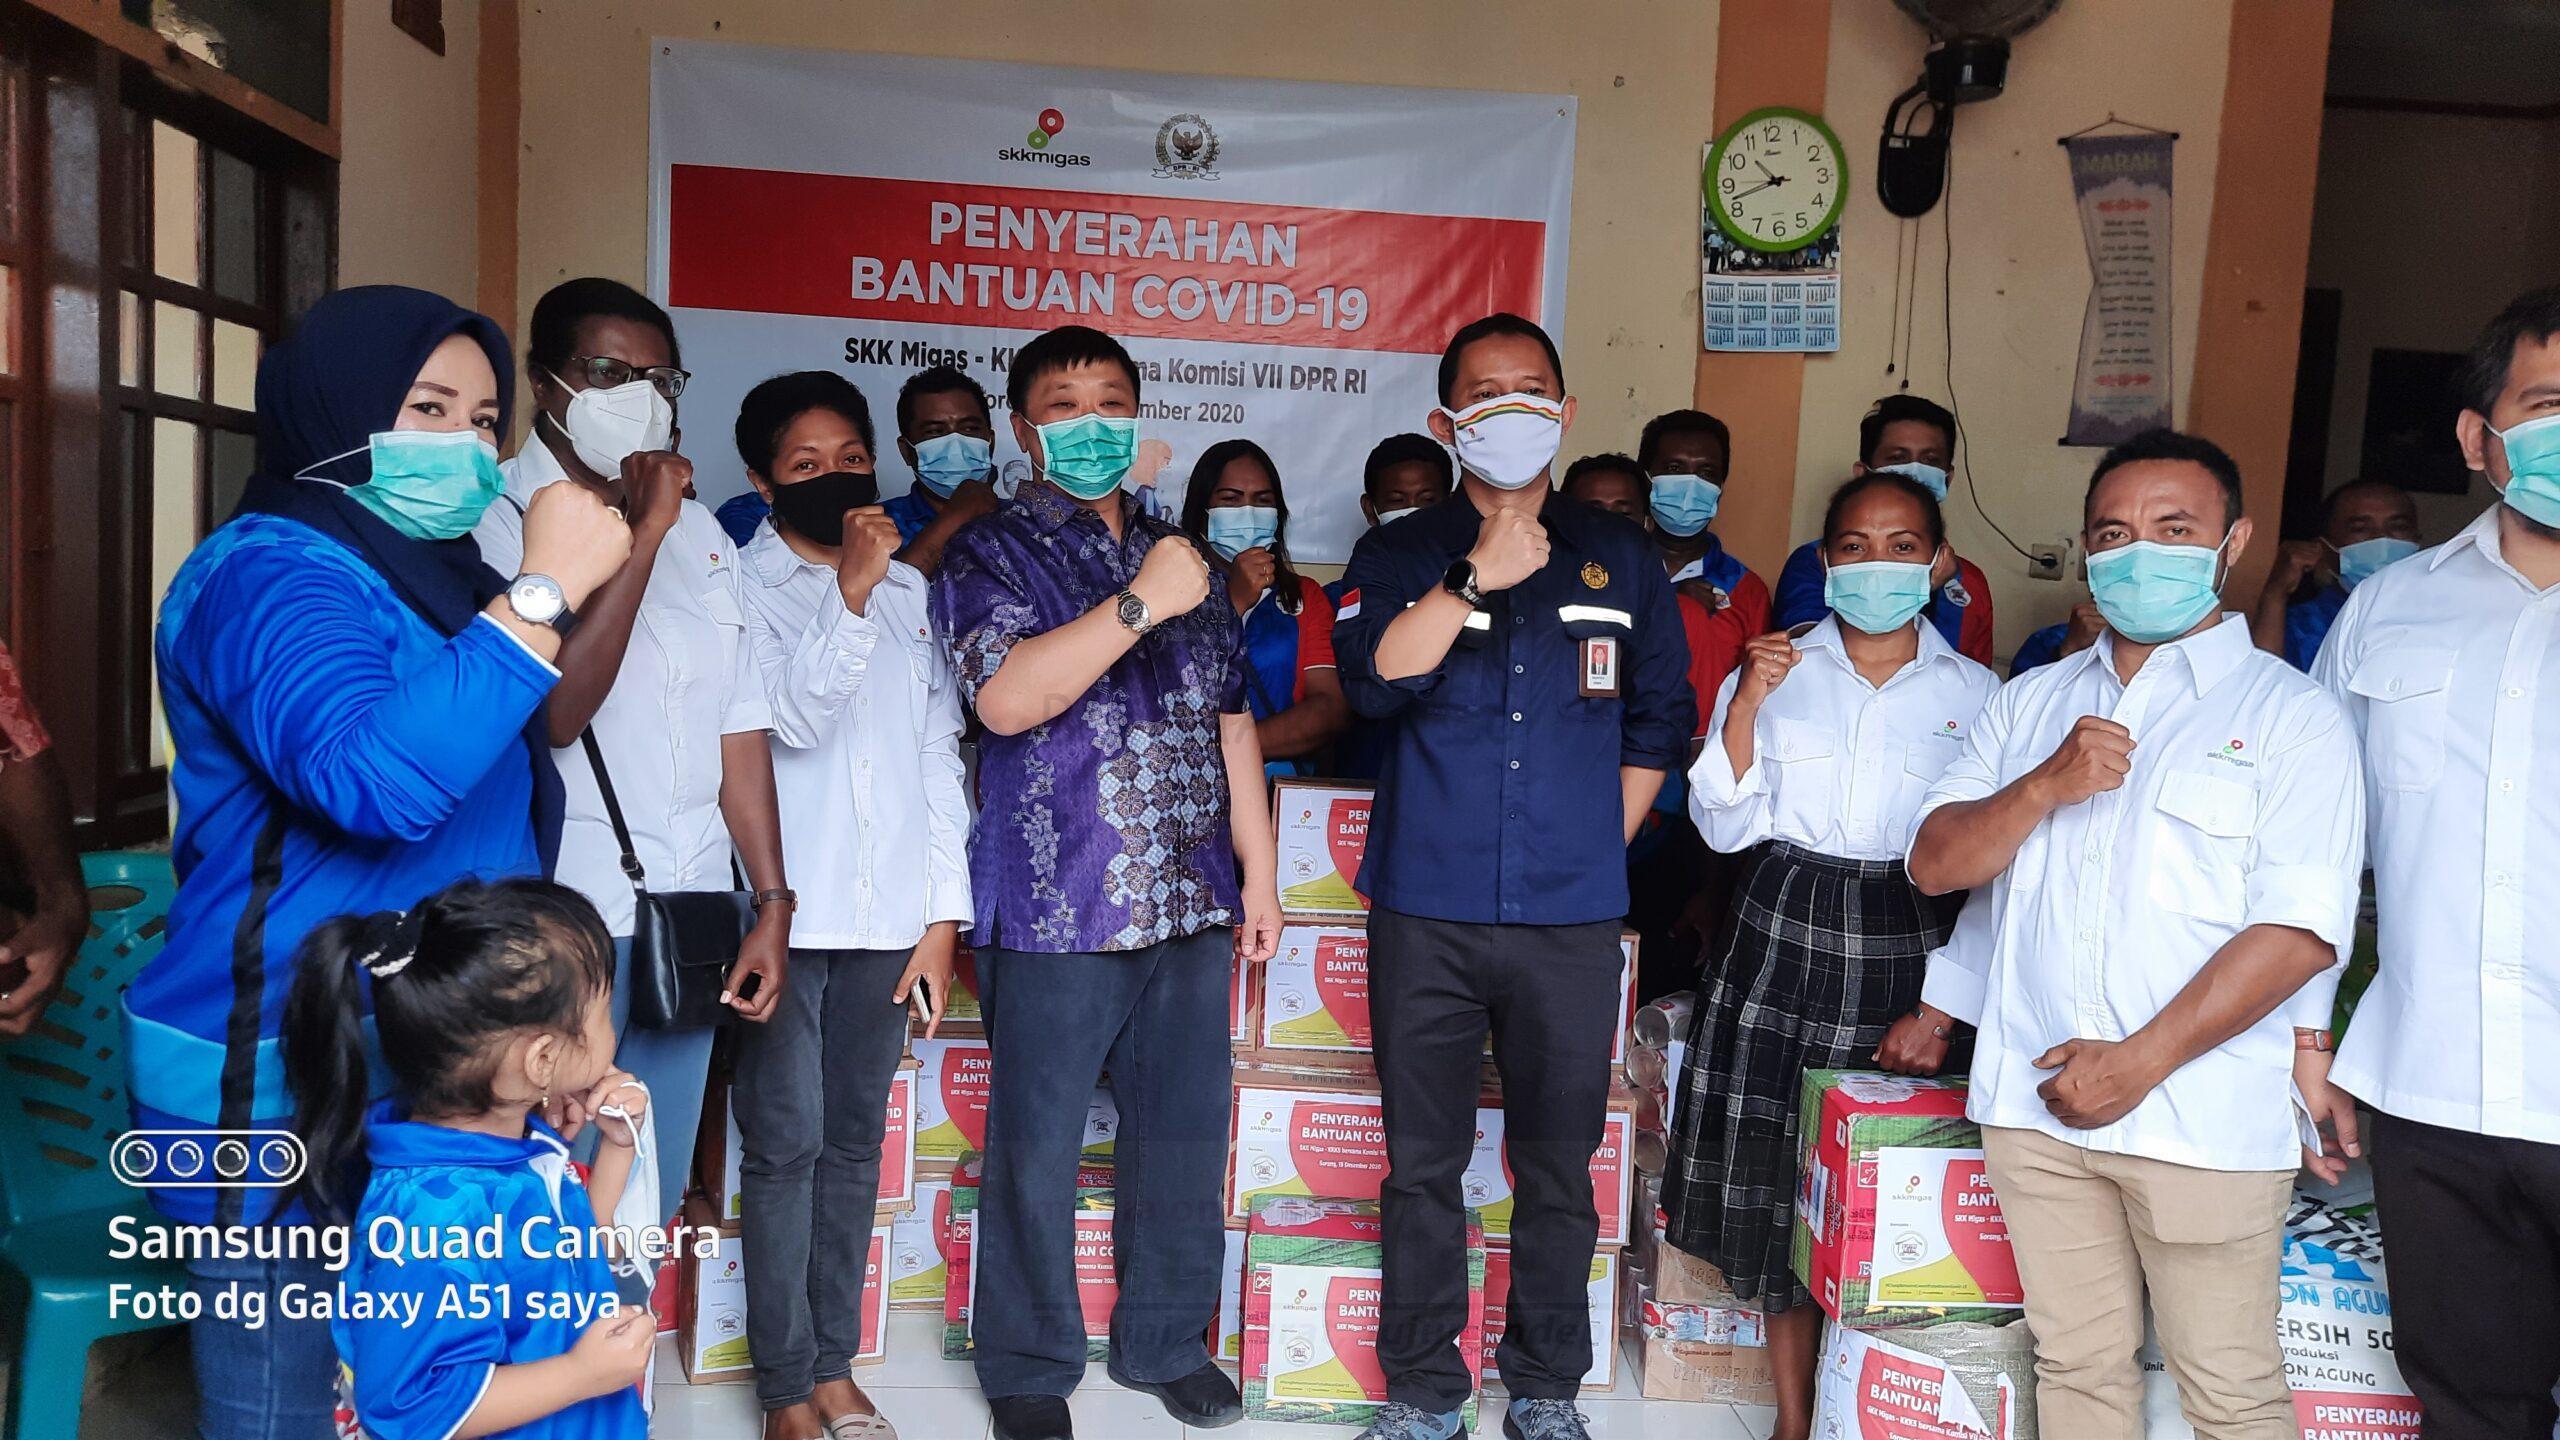 Rico Sia Bersama SKK Migas Serahkan Bantuan Sembako ke 6 Panti Asuhan di Sorong 2 20201216 104126 scaled